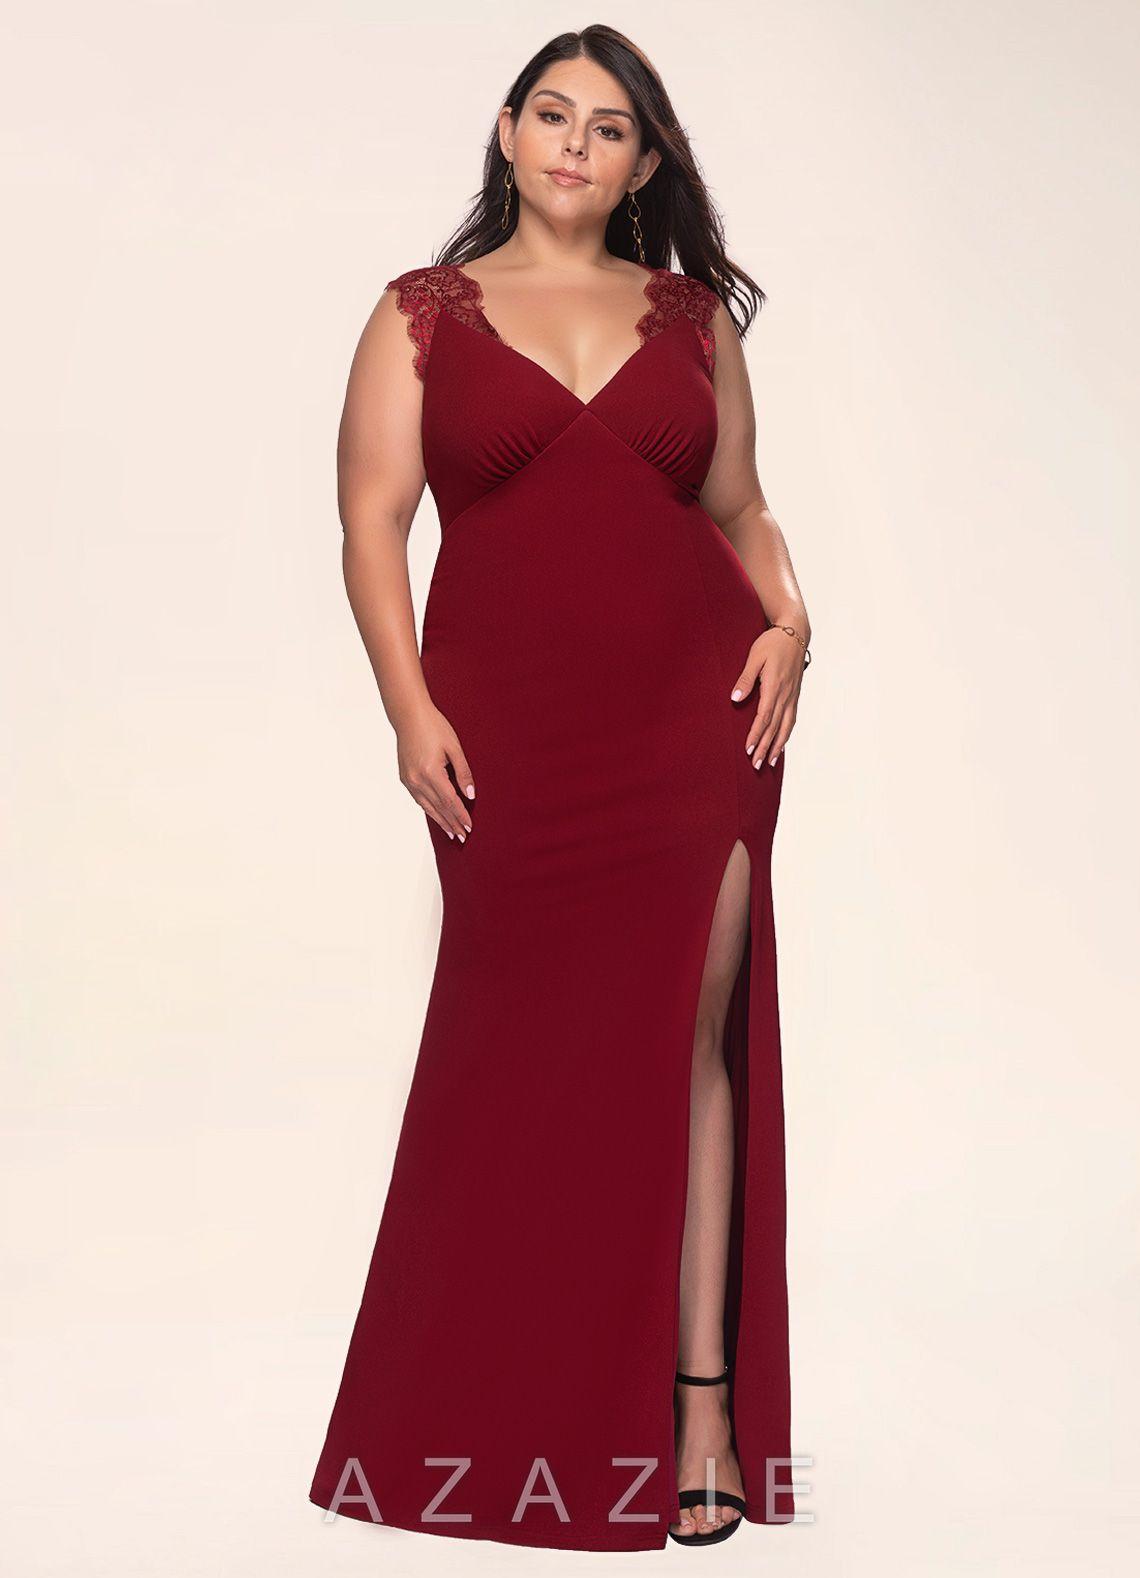 Elegant Love Burgundy Stretch Crepe Maxi Plus Dress Dress   Azazie